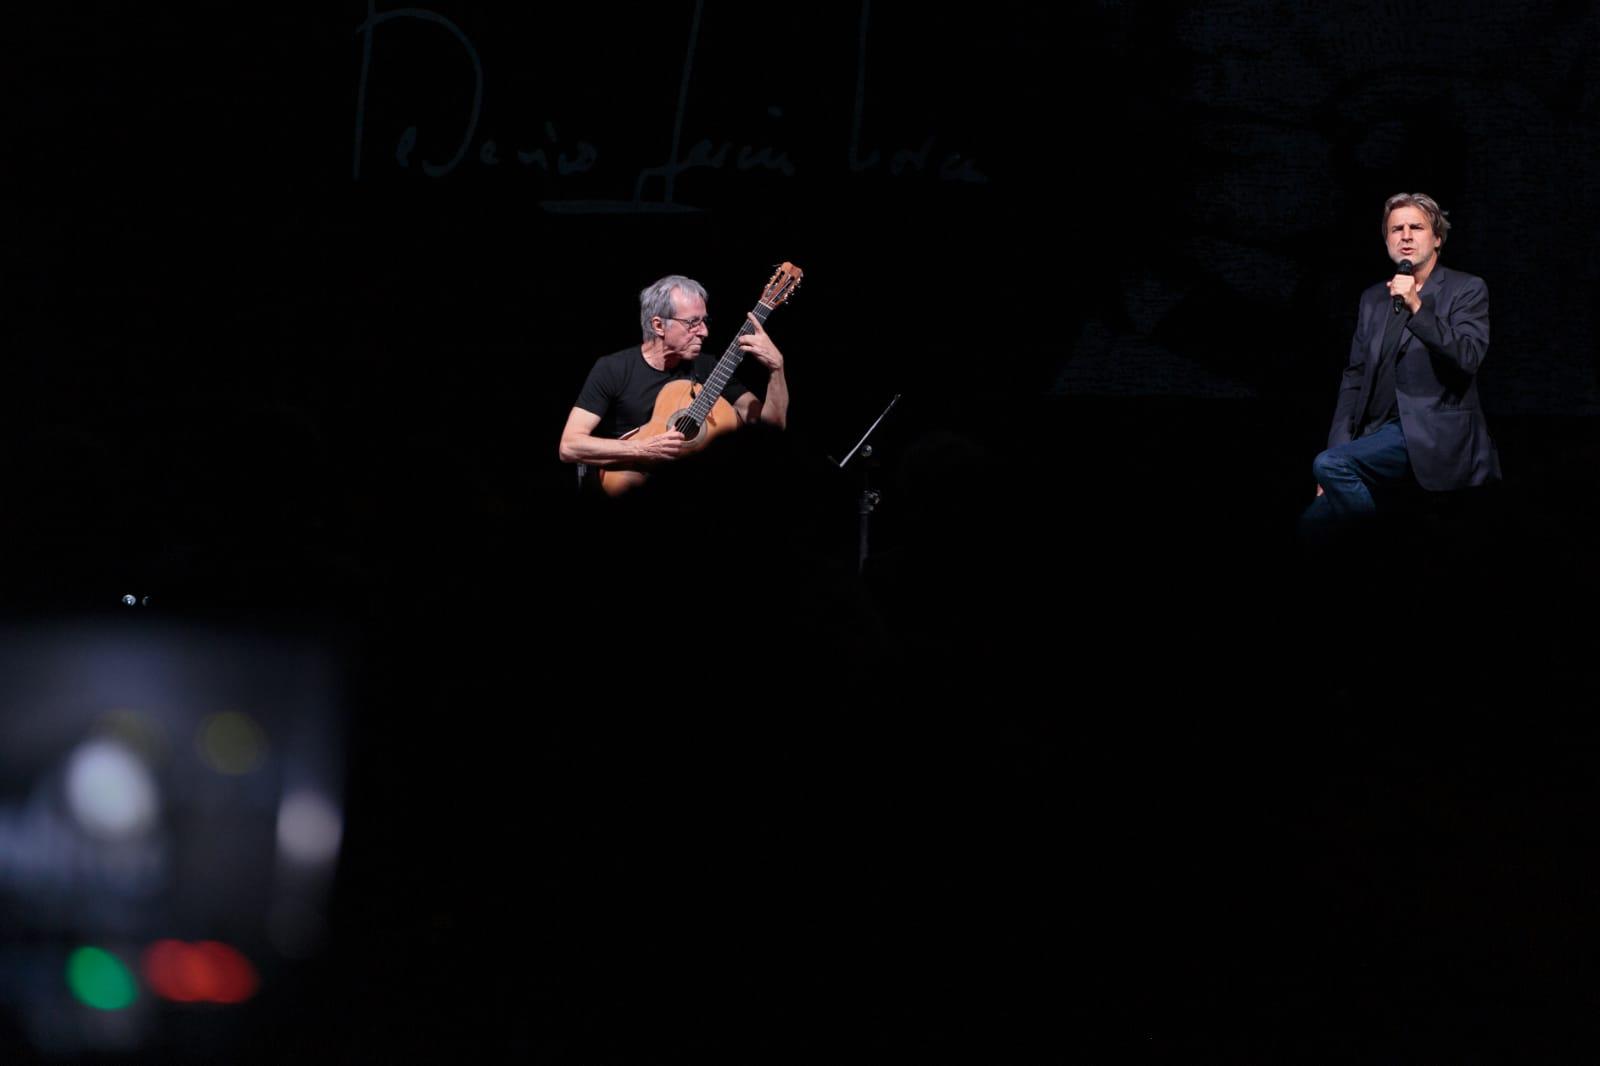 Amar - Alberto San Juan, Fernando Egozcue